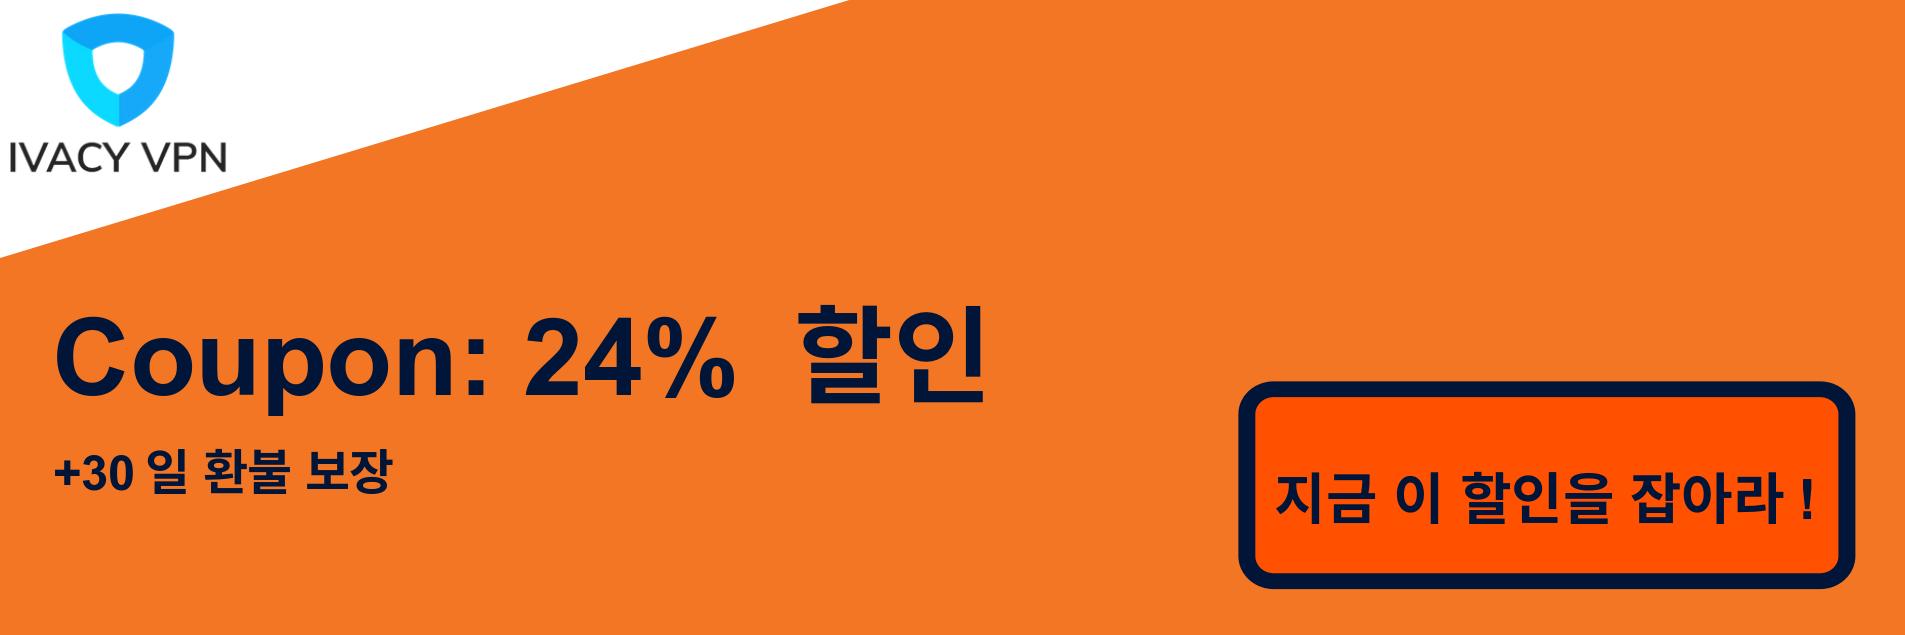 Ivacy VPN 쿠폰 배너-24 % 할인